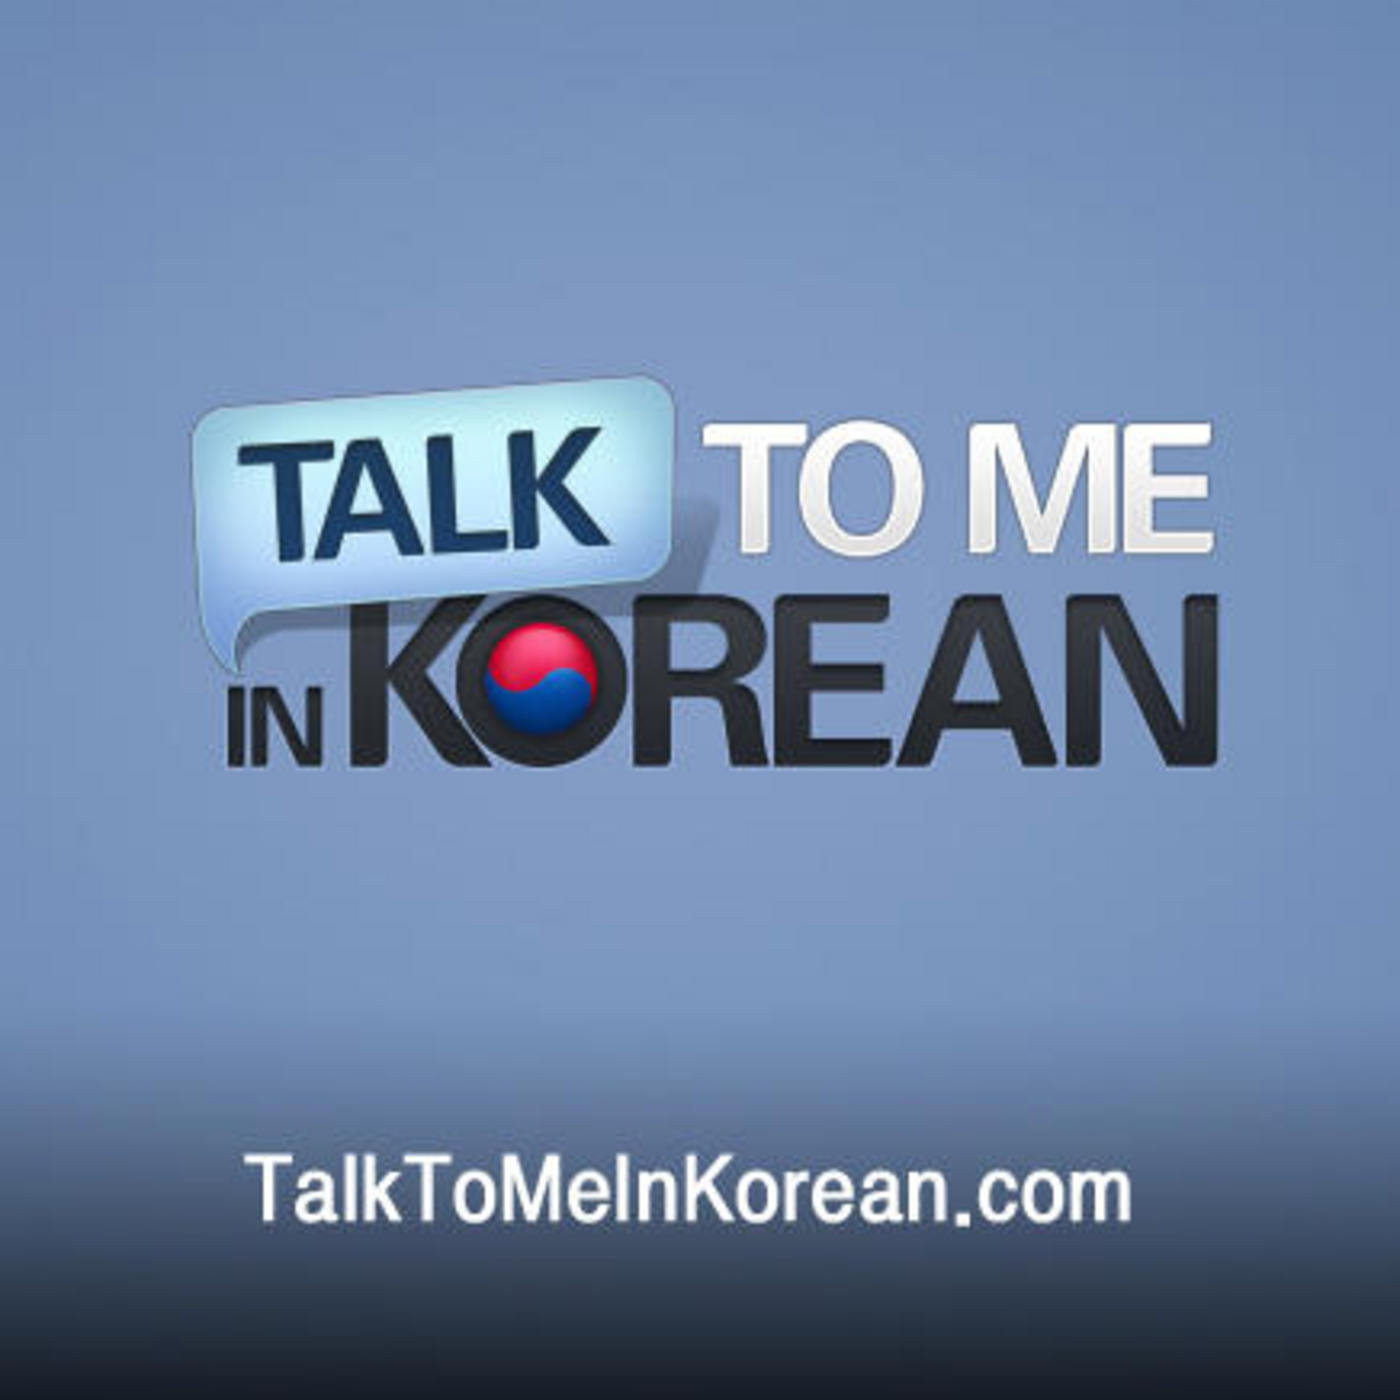 talk to me in korean level 2 lesson 2 pdf